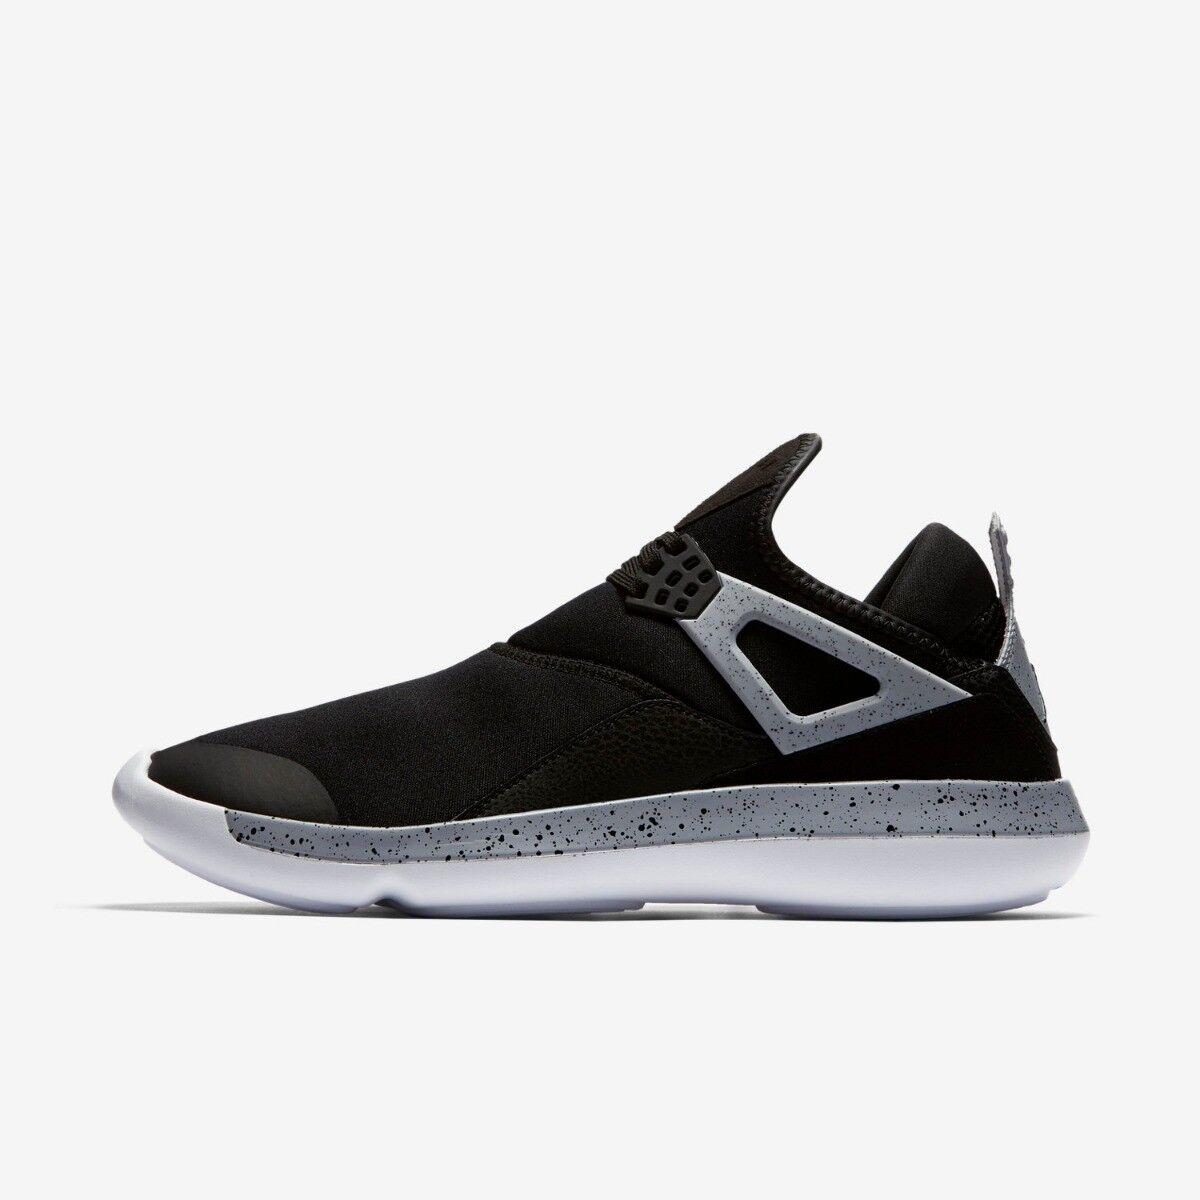 Nike Jordan SCHUHE Fliege '89 Herren Turnschuh Schuhe Größe 10 SCHUHE Jordan RUN ead70c